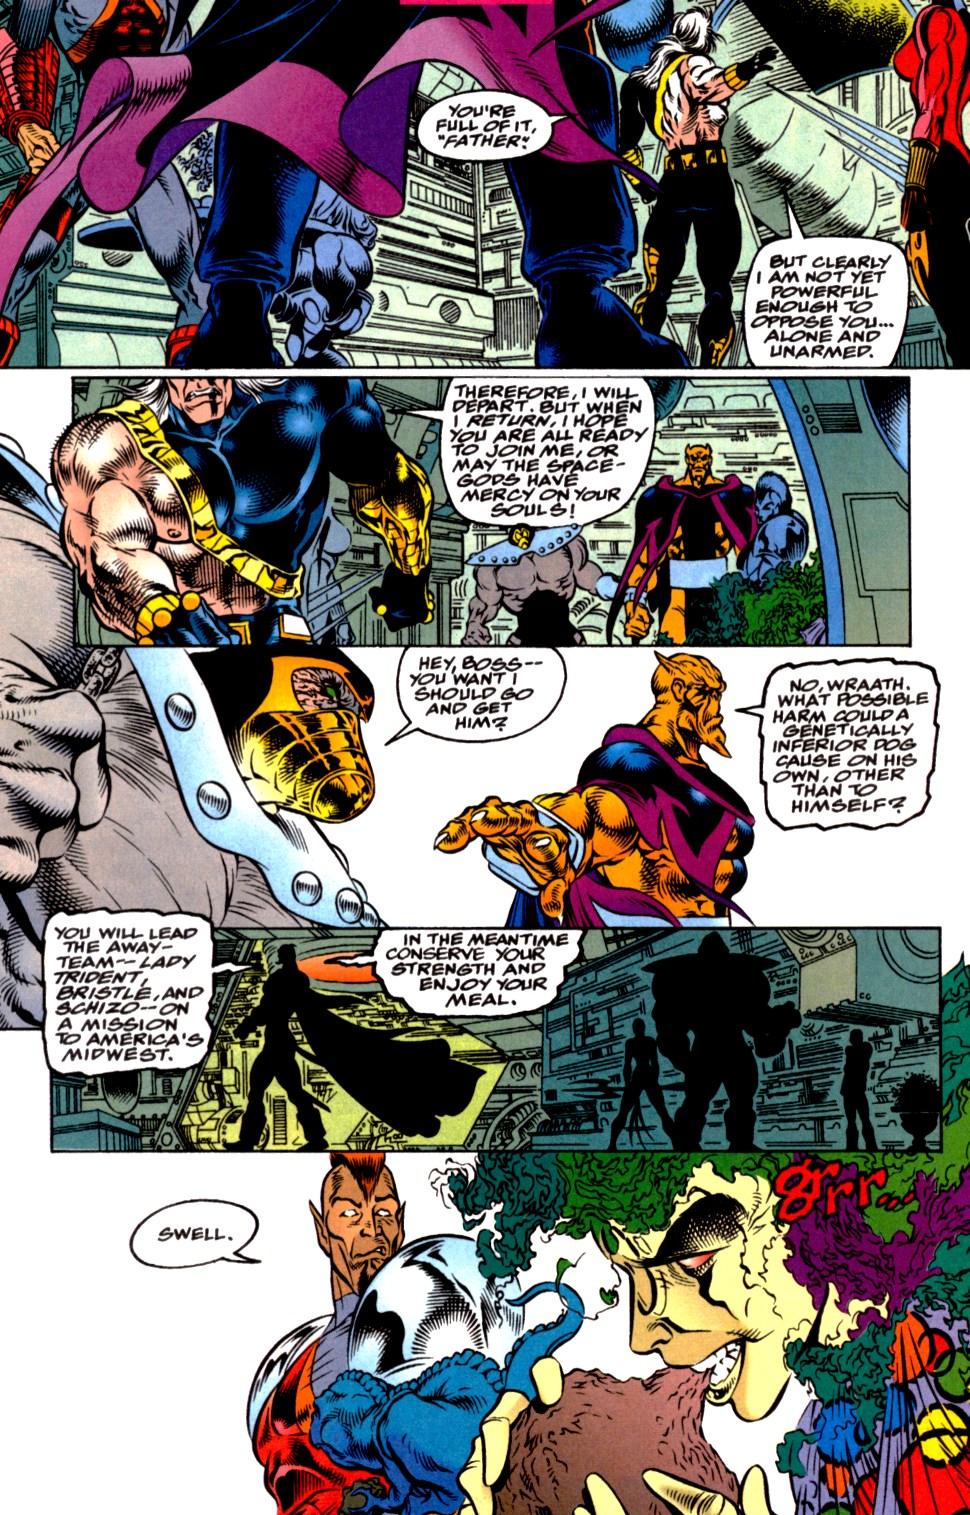 Read online Blackwulf comic -  Issue #2 - 7